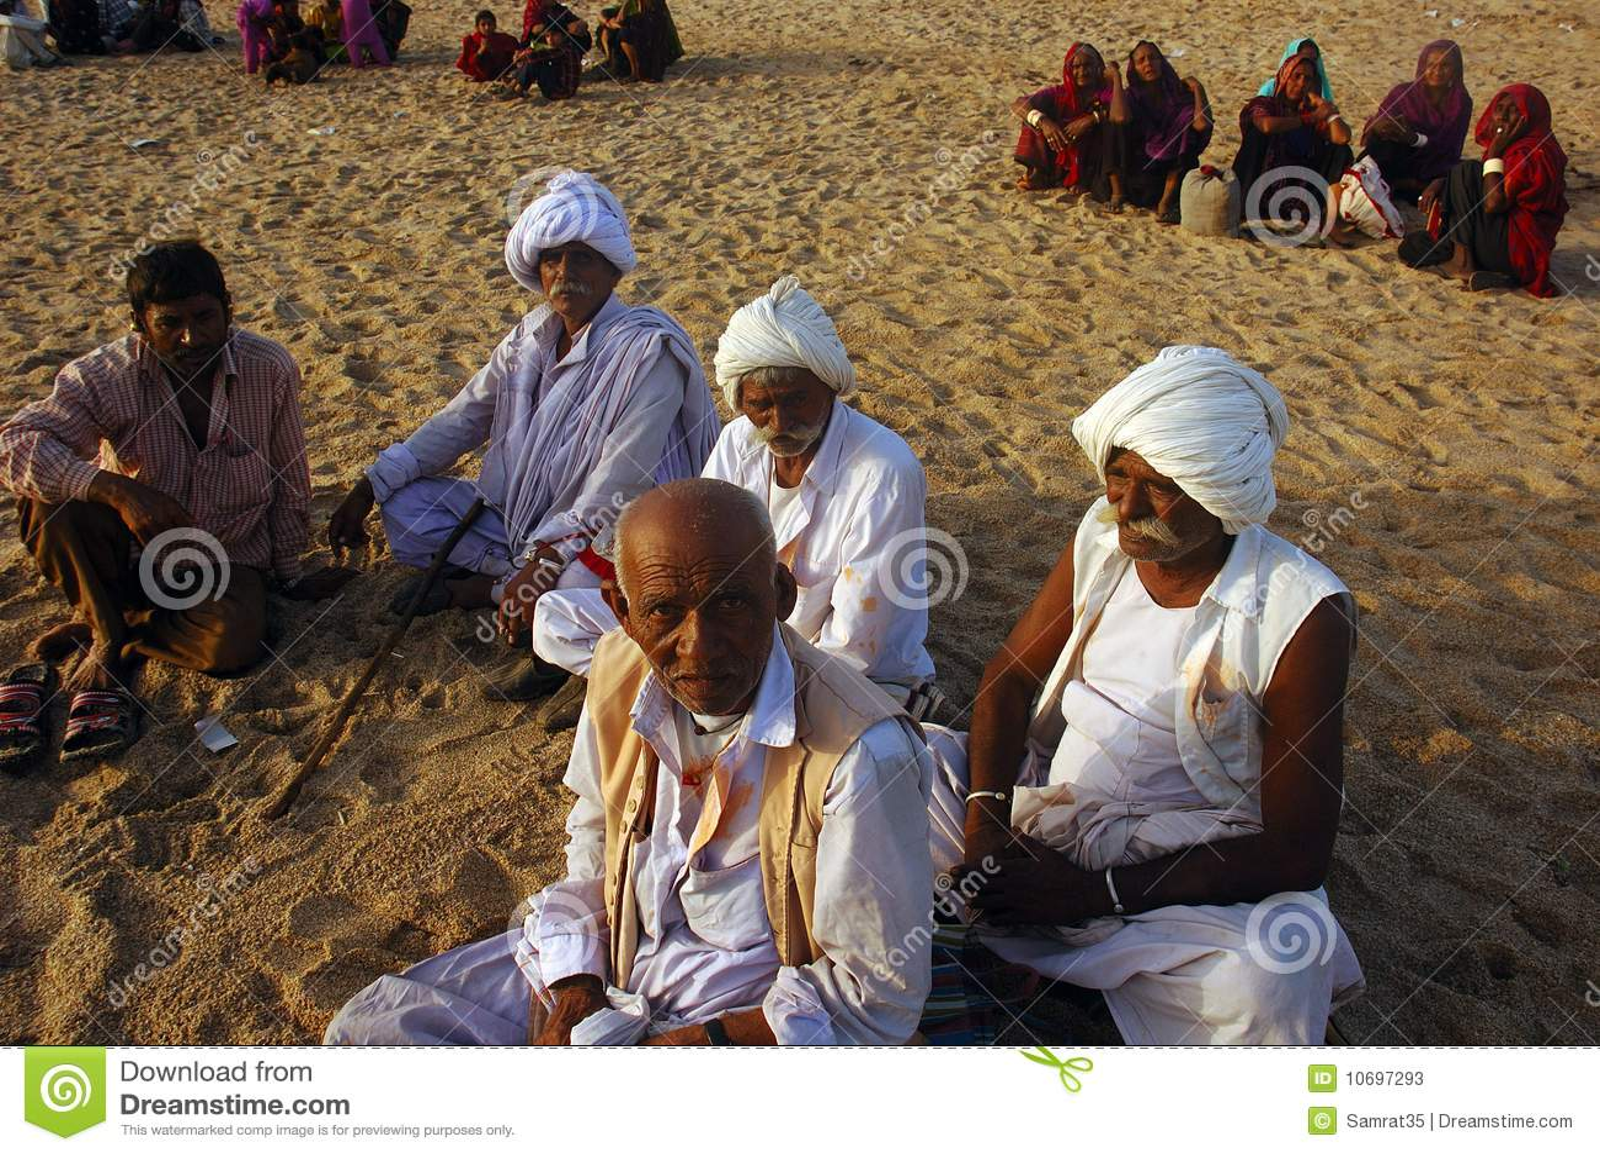 folk life in gujarat-india editorial stock photo